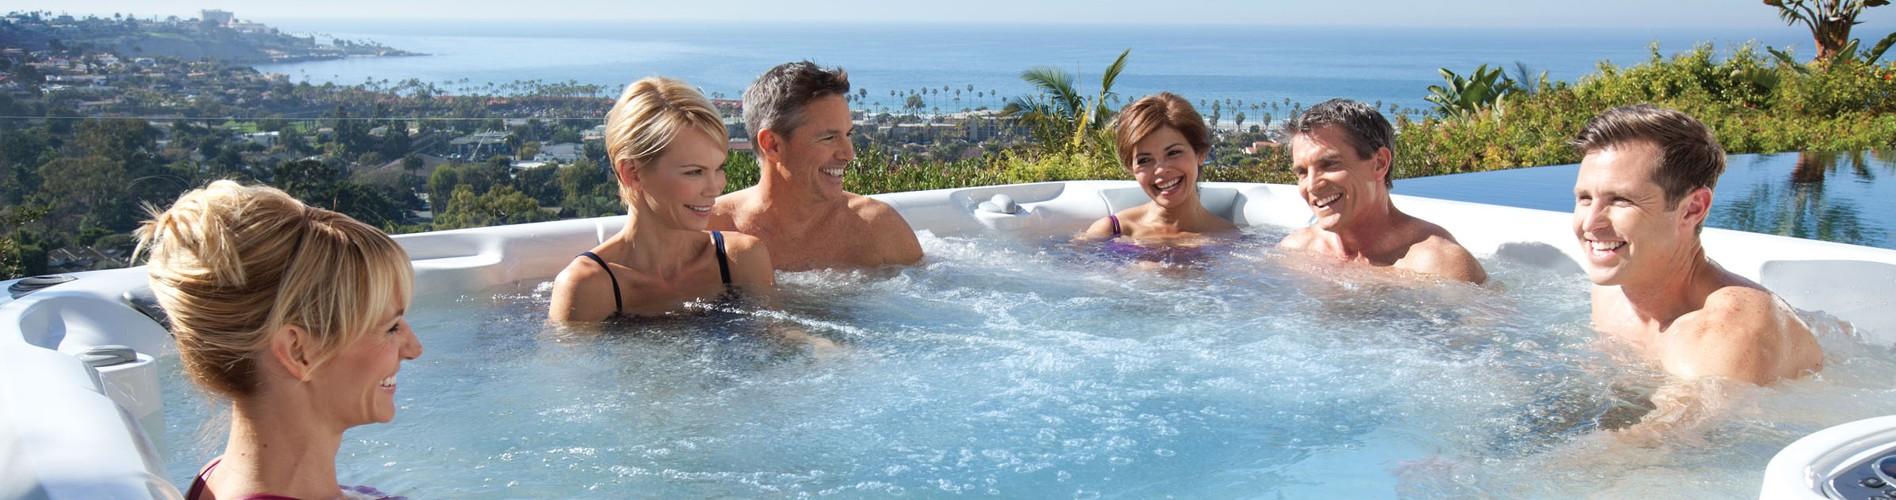 Hot Tubs Dealer Wentzville Shares 3 Attitude Improvement Tips